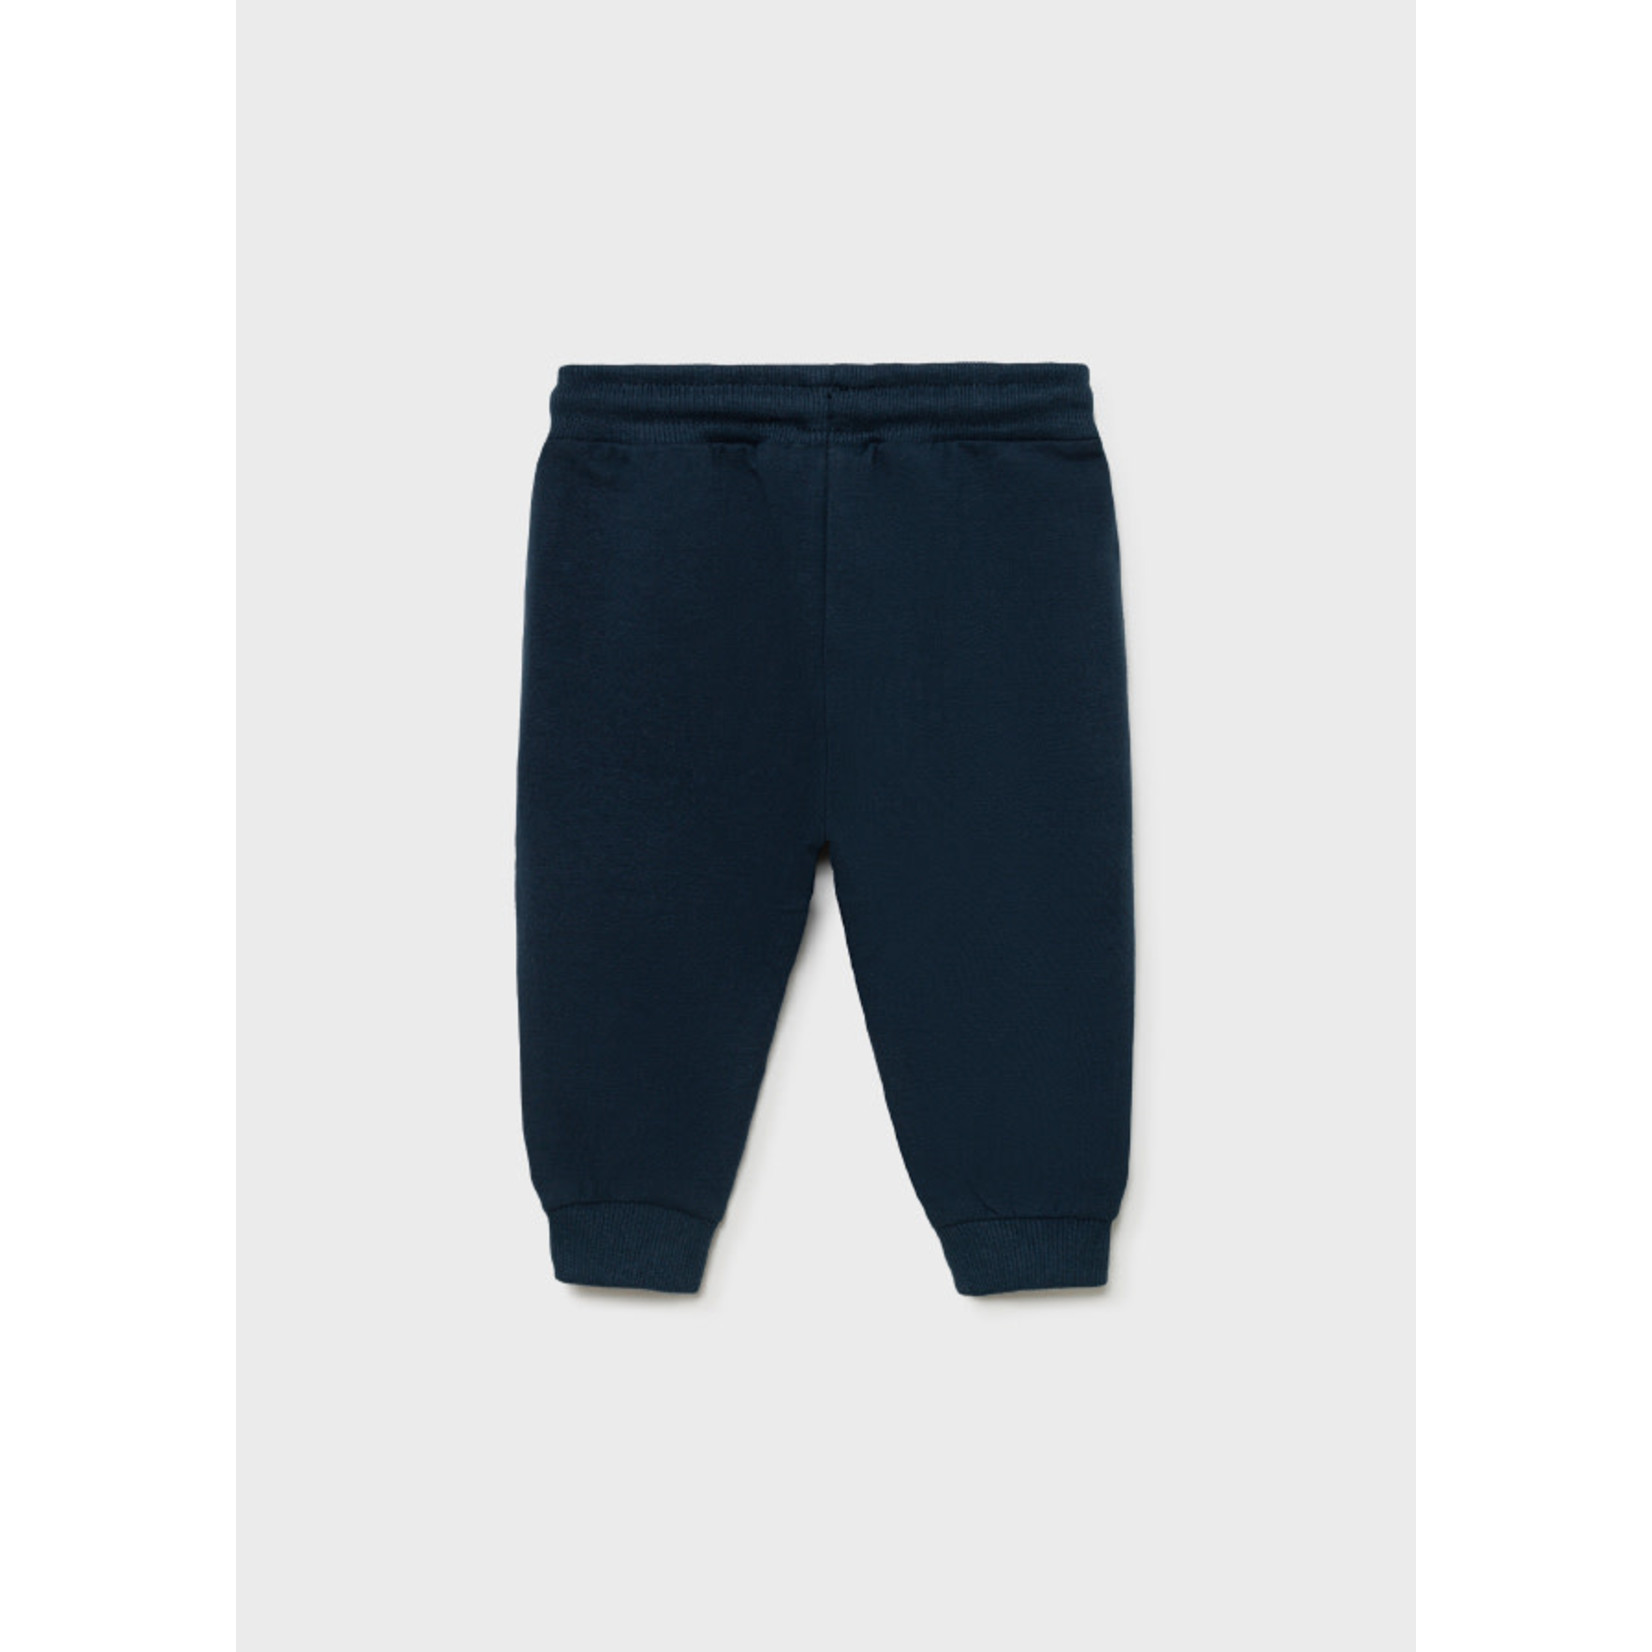 Mayoral Basic Cuffed Fleece Trousers, Blue